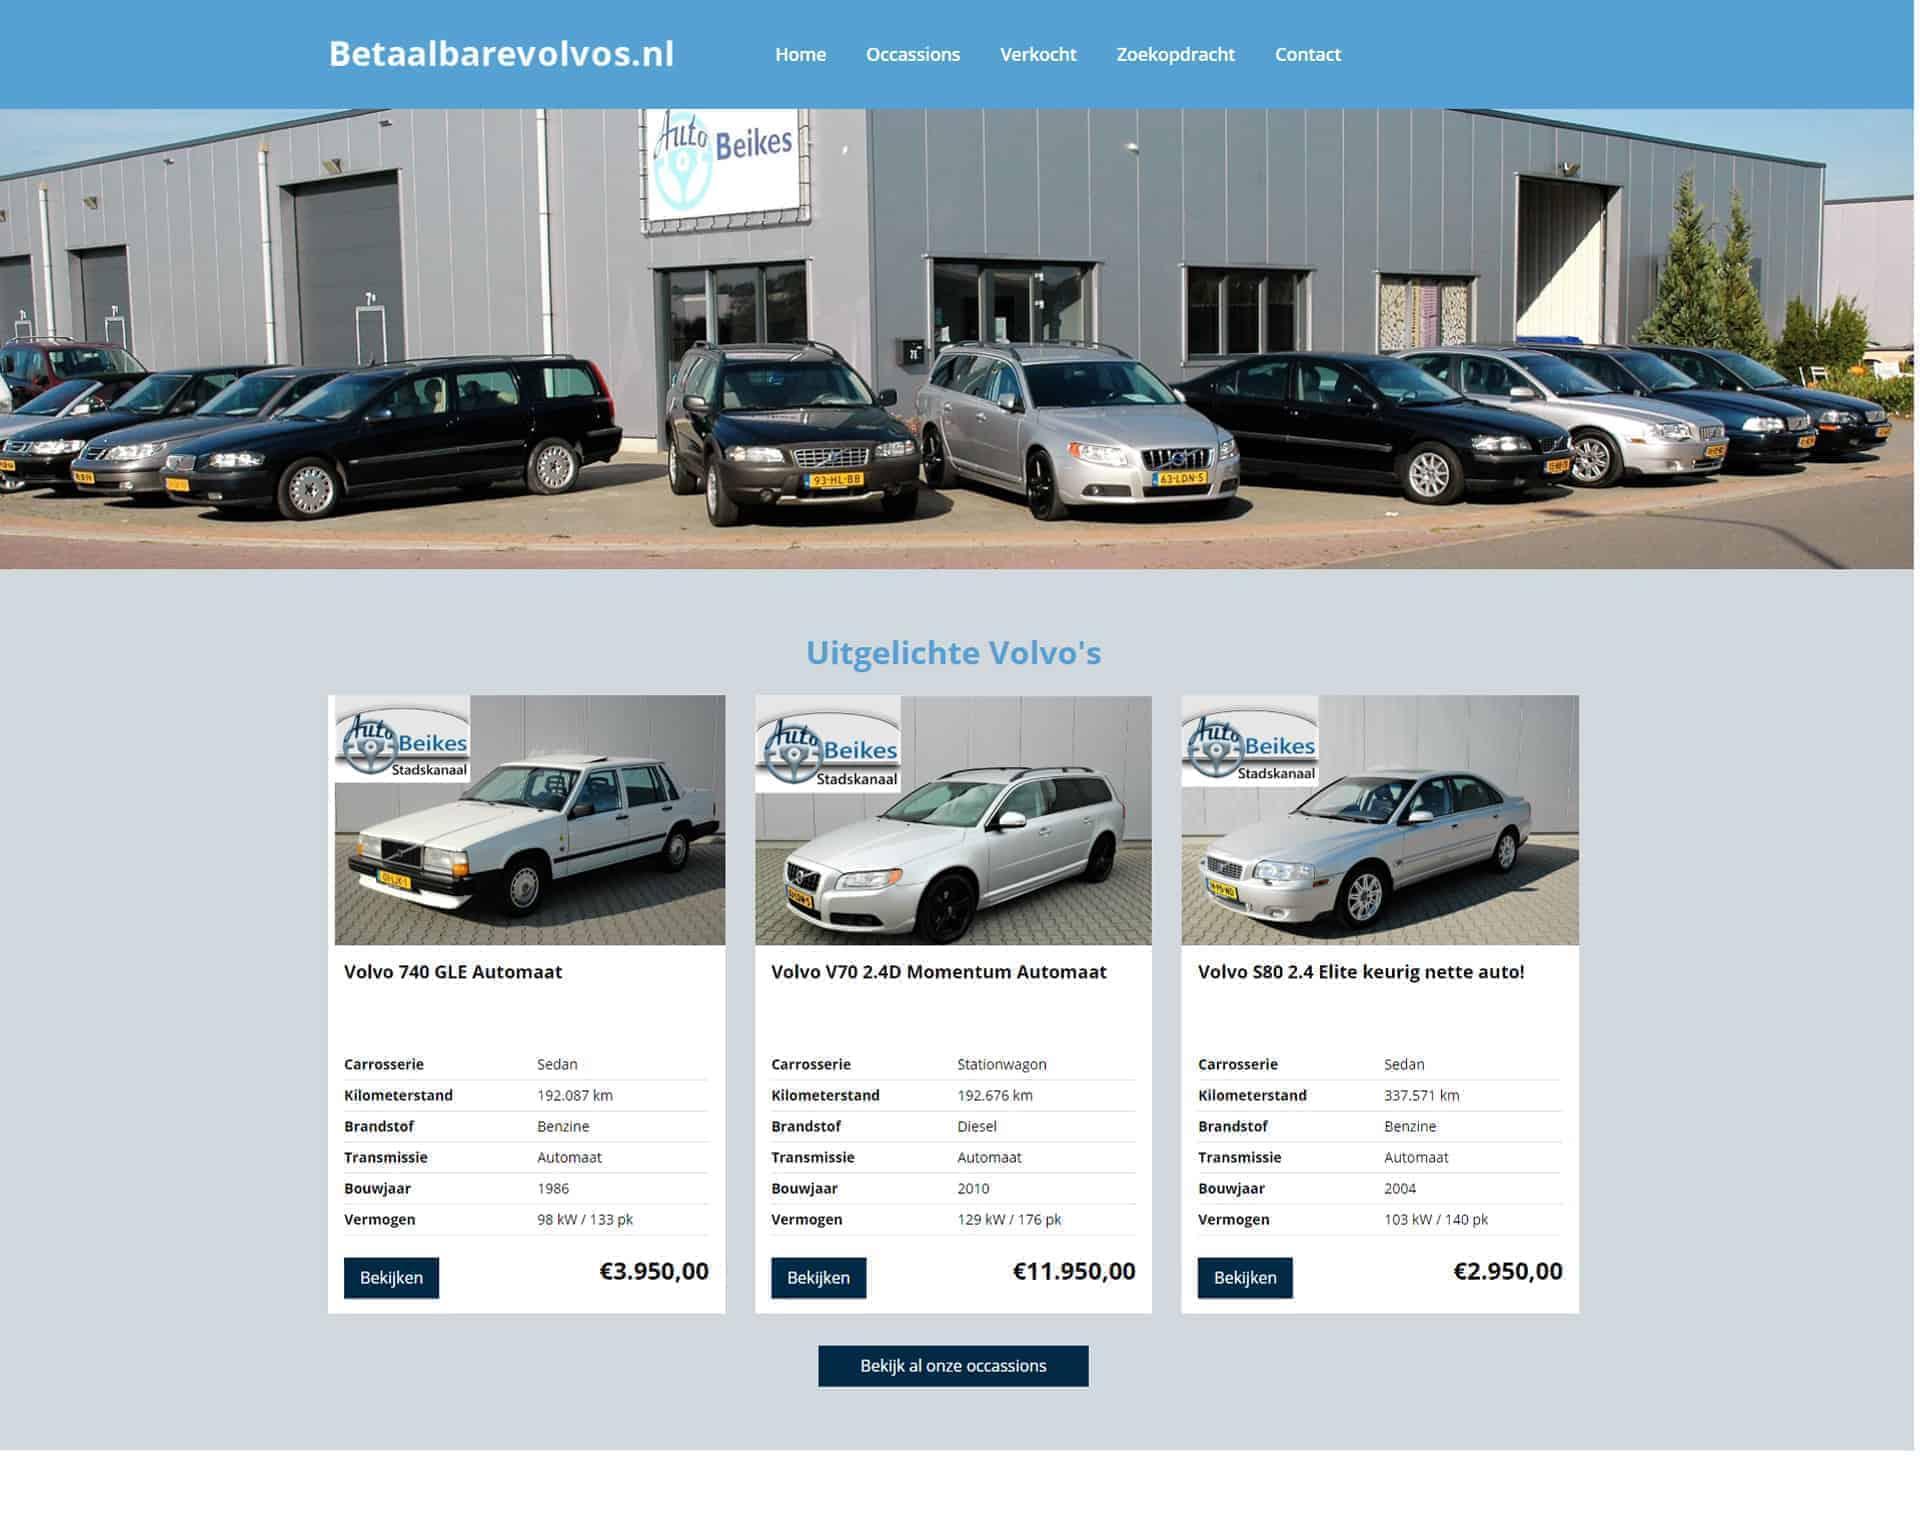 Betaalbare Volvos